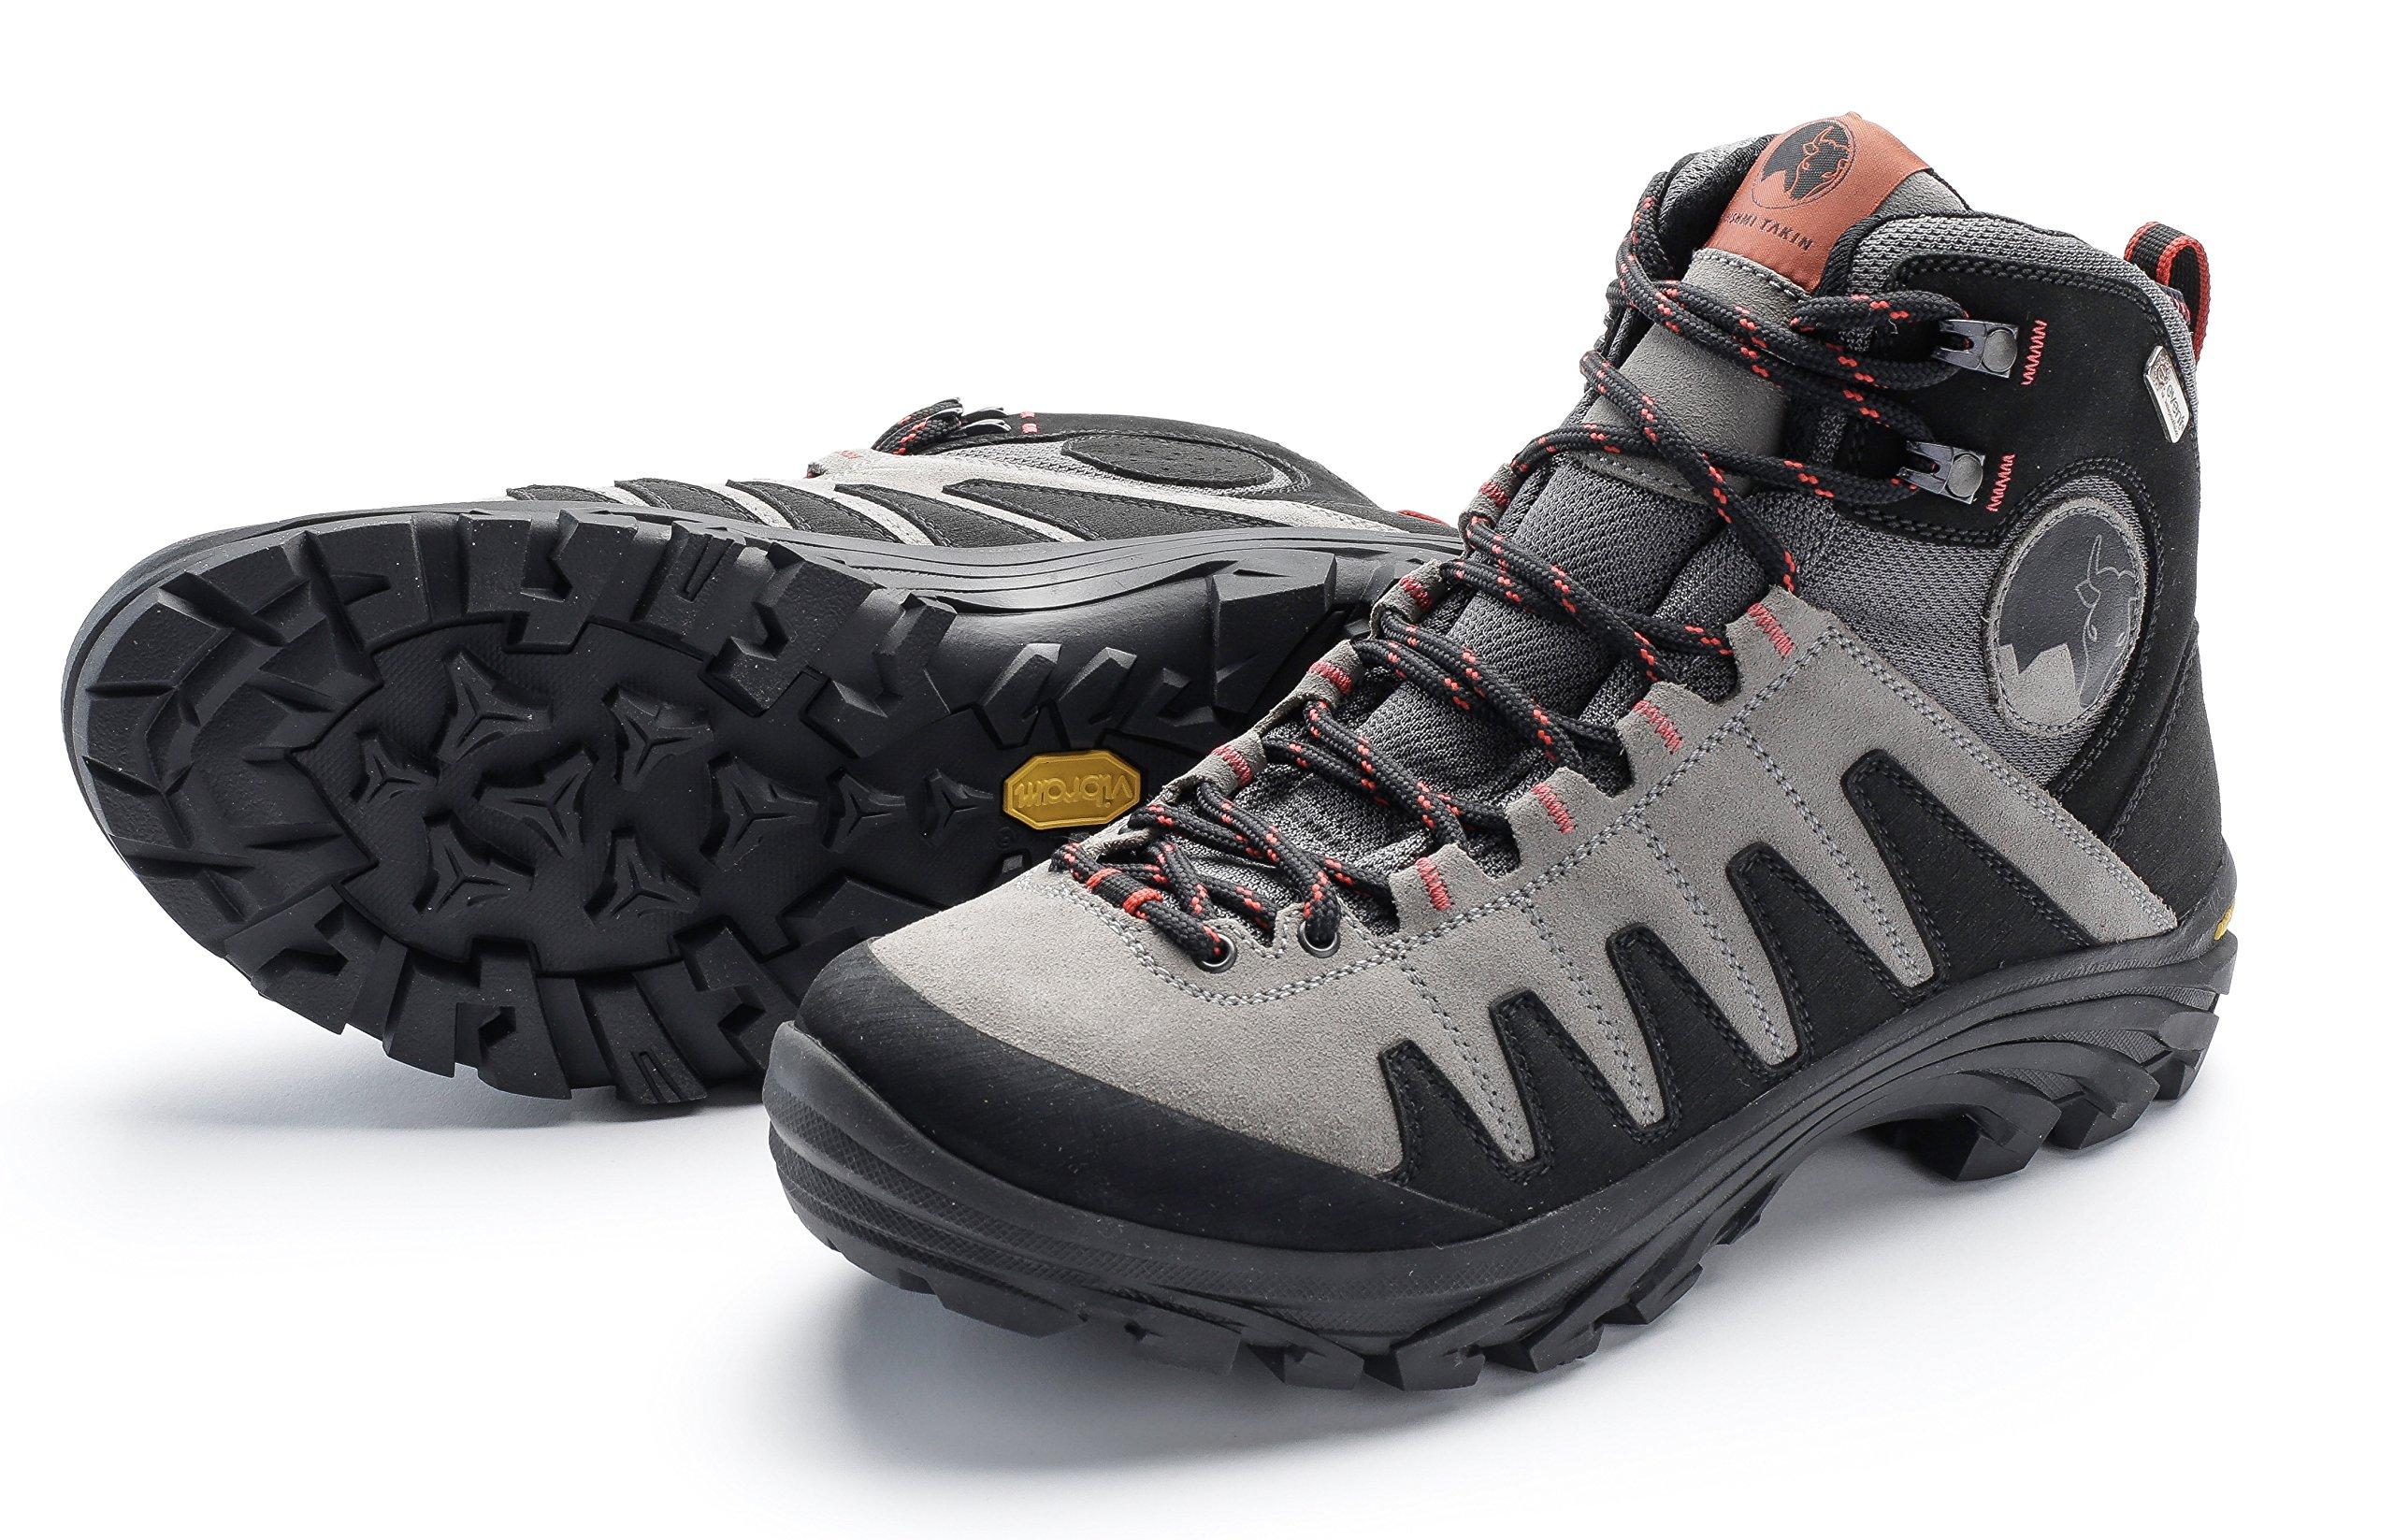 Mishmi Takin Kameng Mid Event Waterproof Hiking Boot (EU 38/US Women 7.5, Grey)